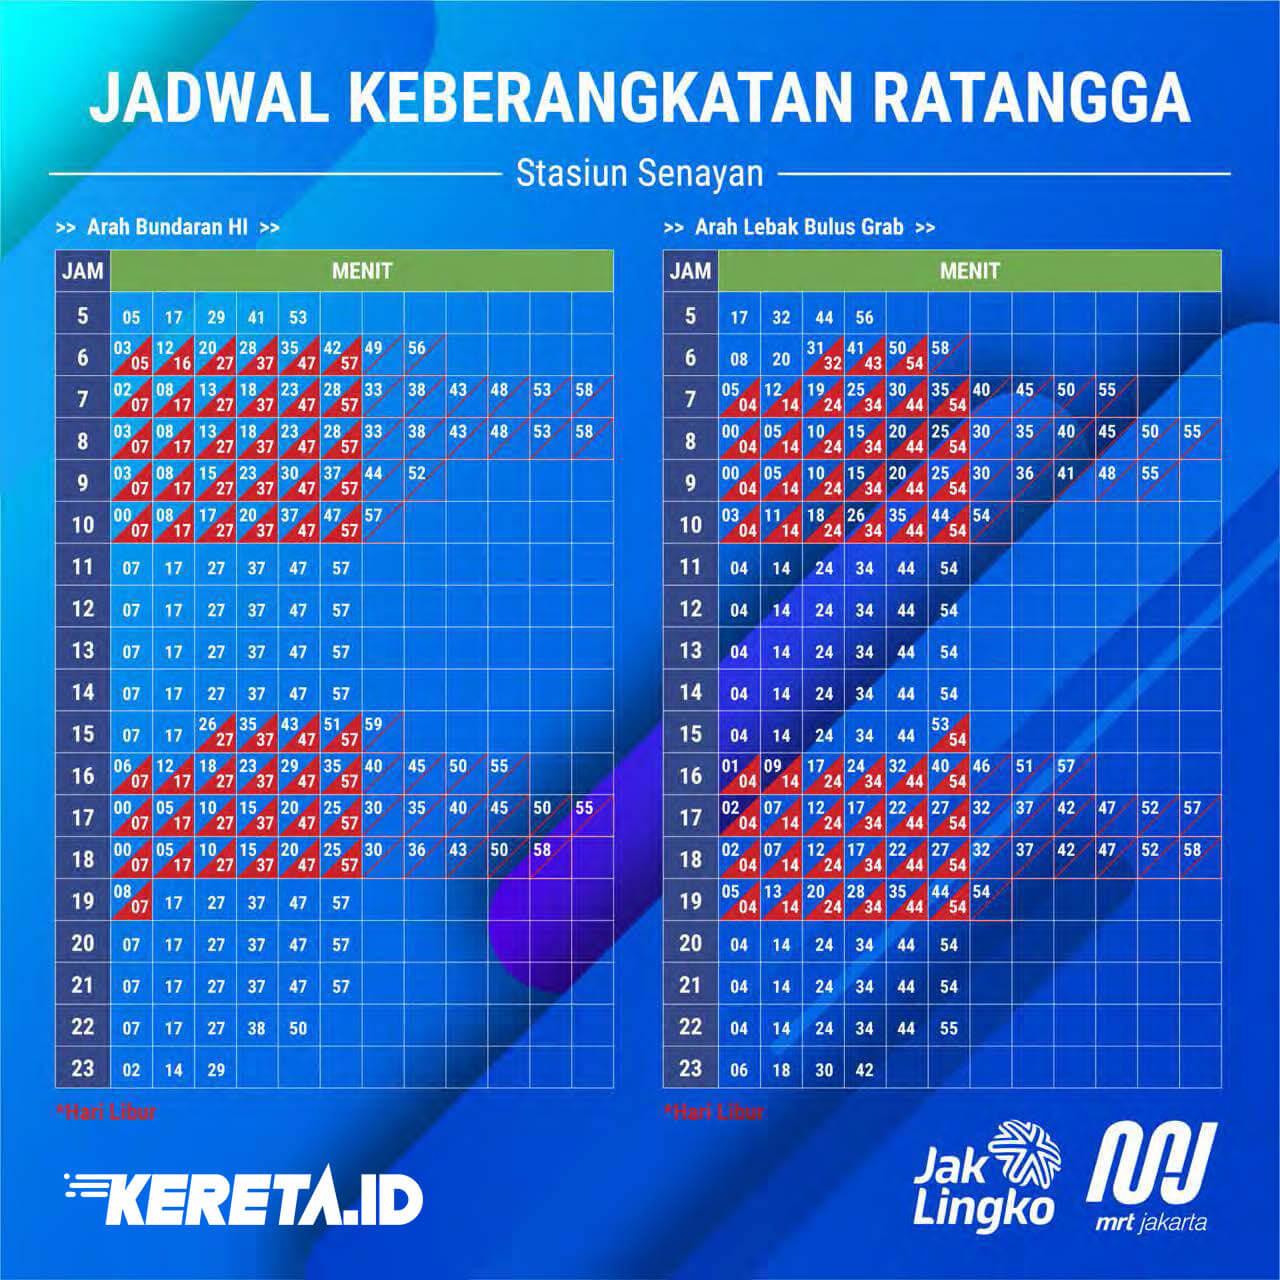 Jadwal-Keberangkatan-MRT-stasiun-senayan